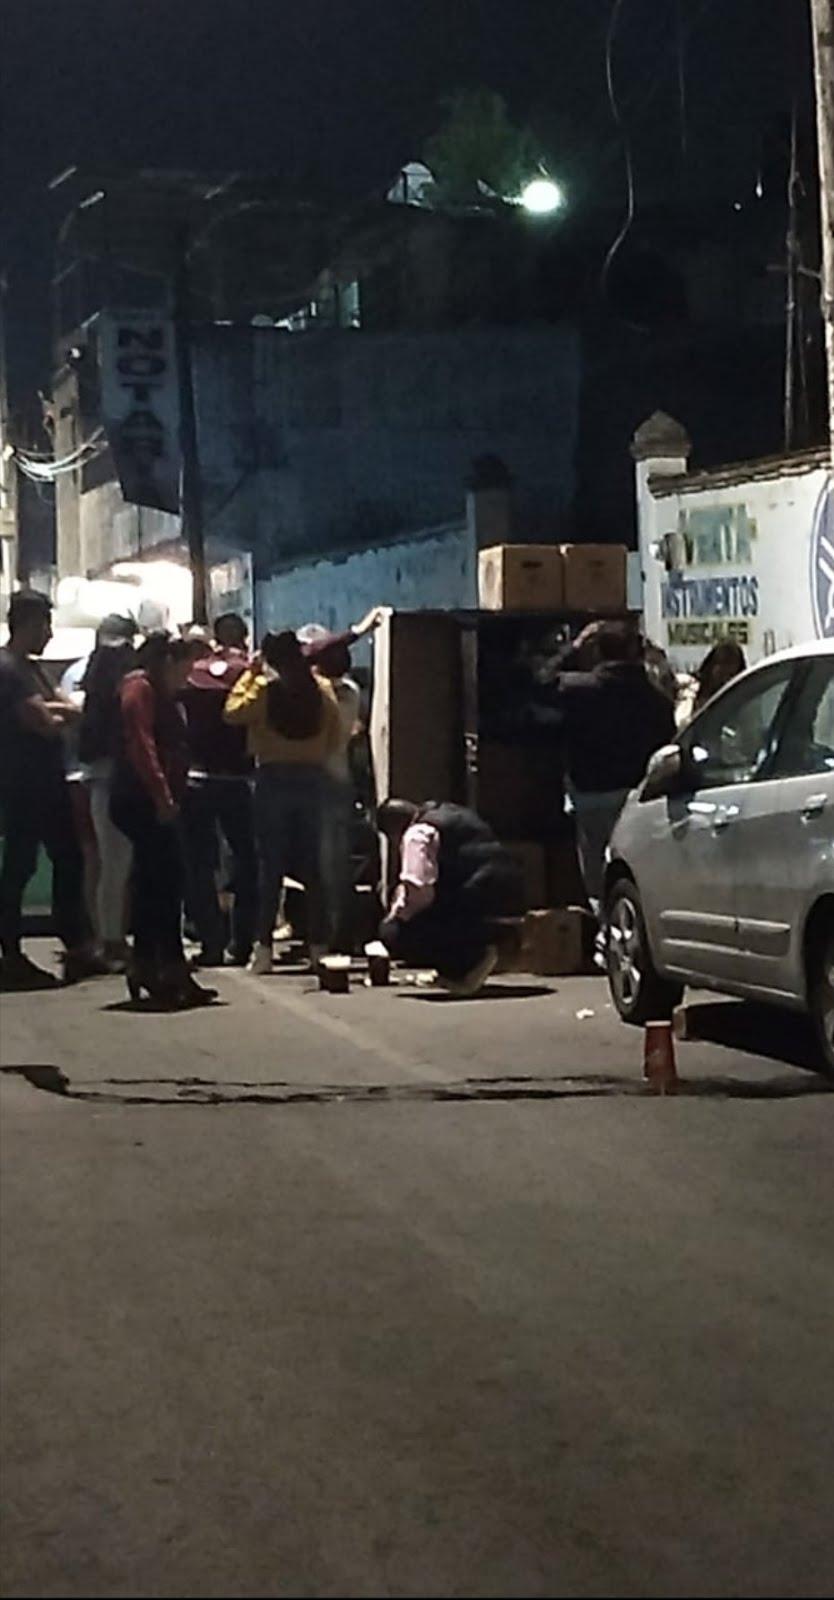 Alcohol, corrupción e inmundicia, característica de la Feria de Tláhuac